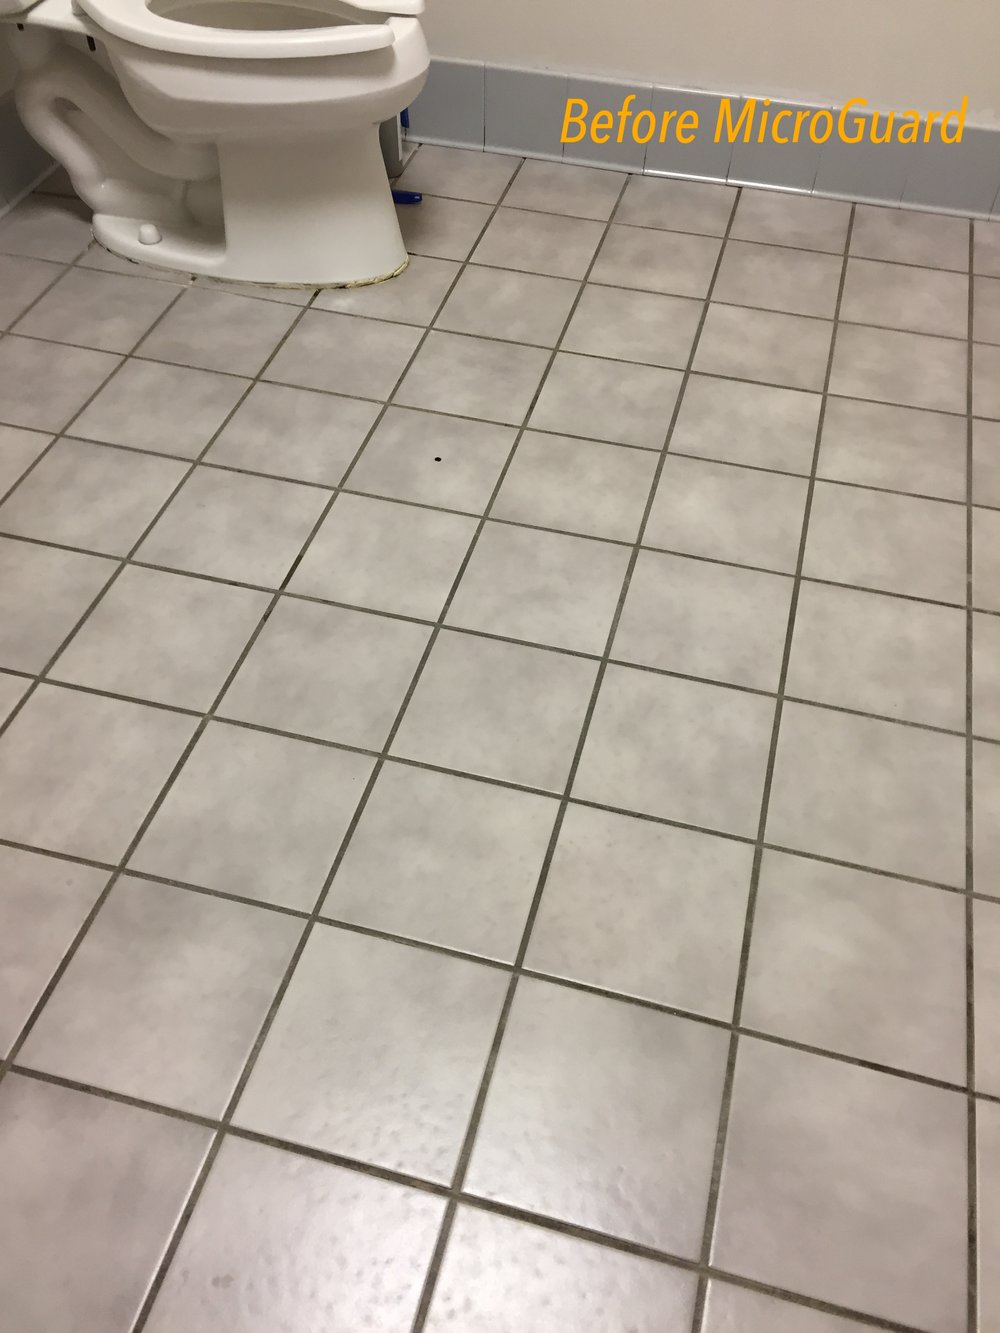 2 commercial restroom cleaned.JPG